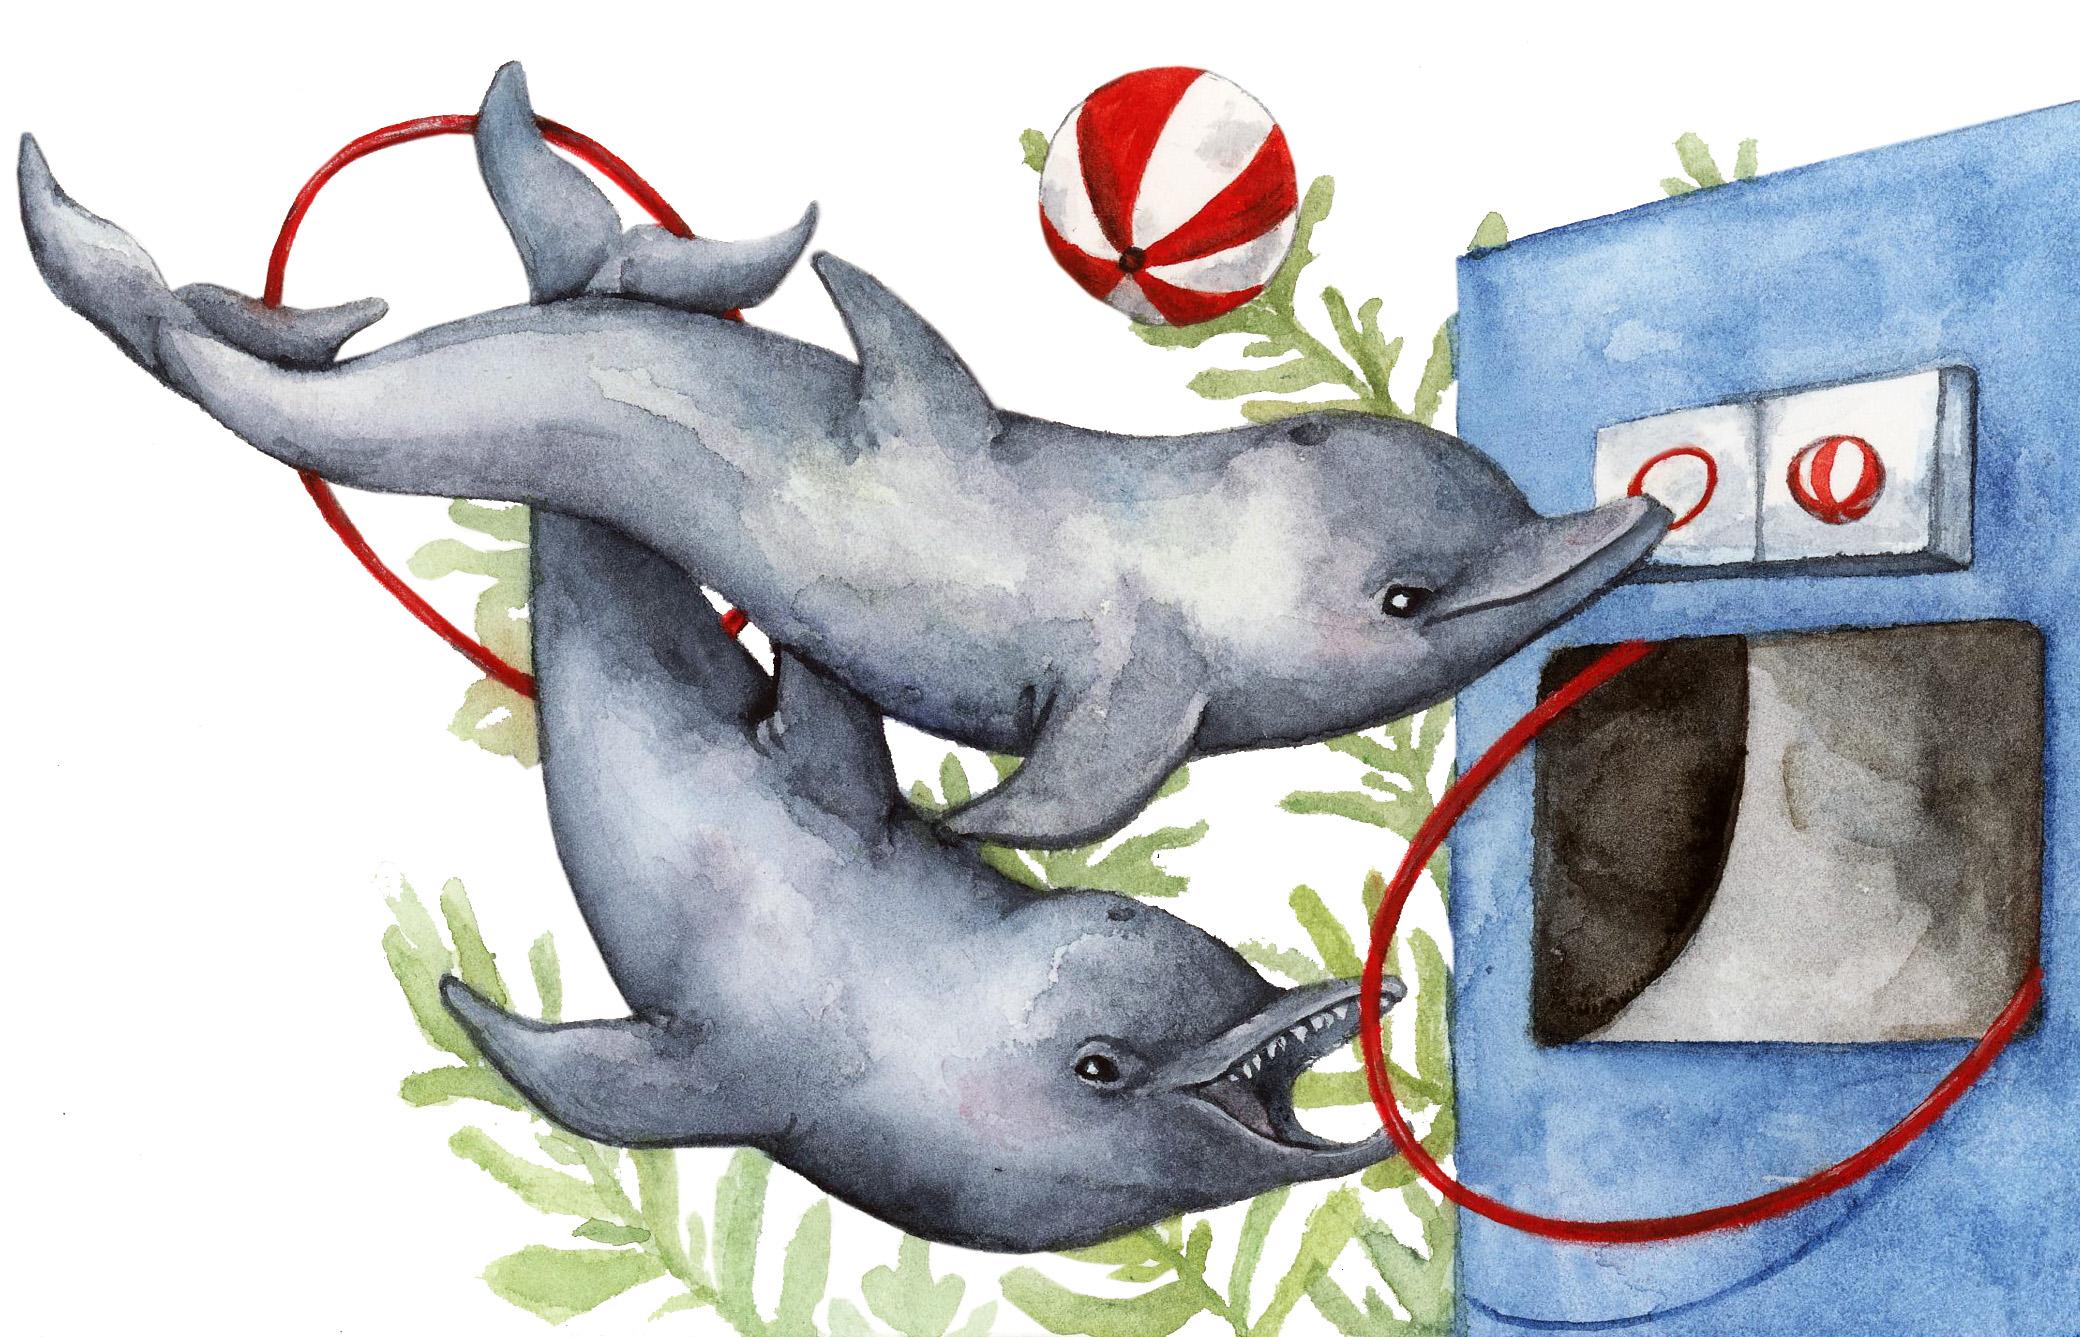 Dolphin-speak